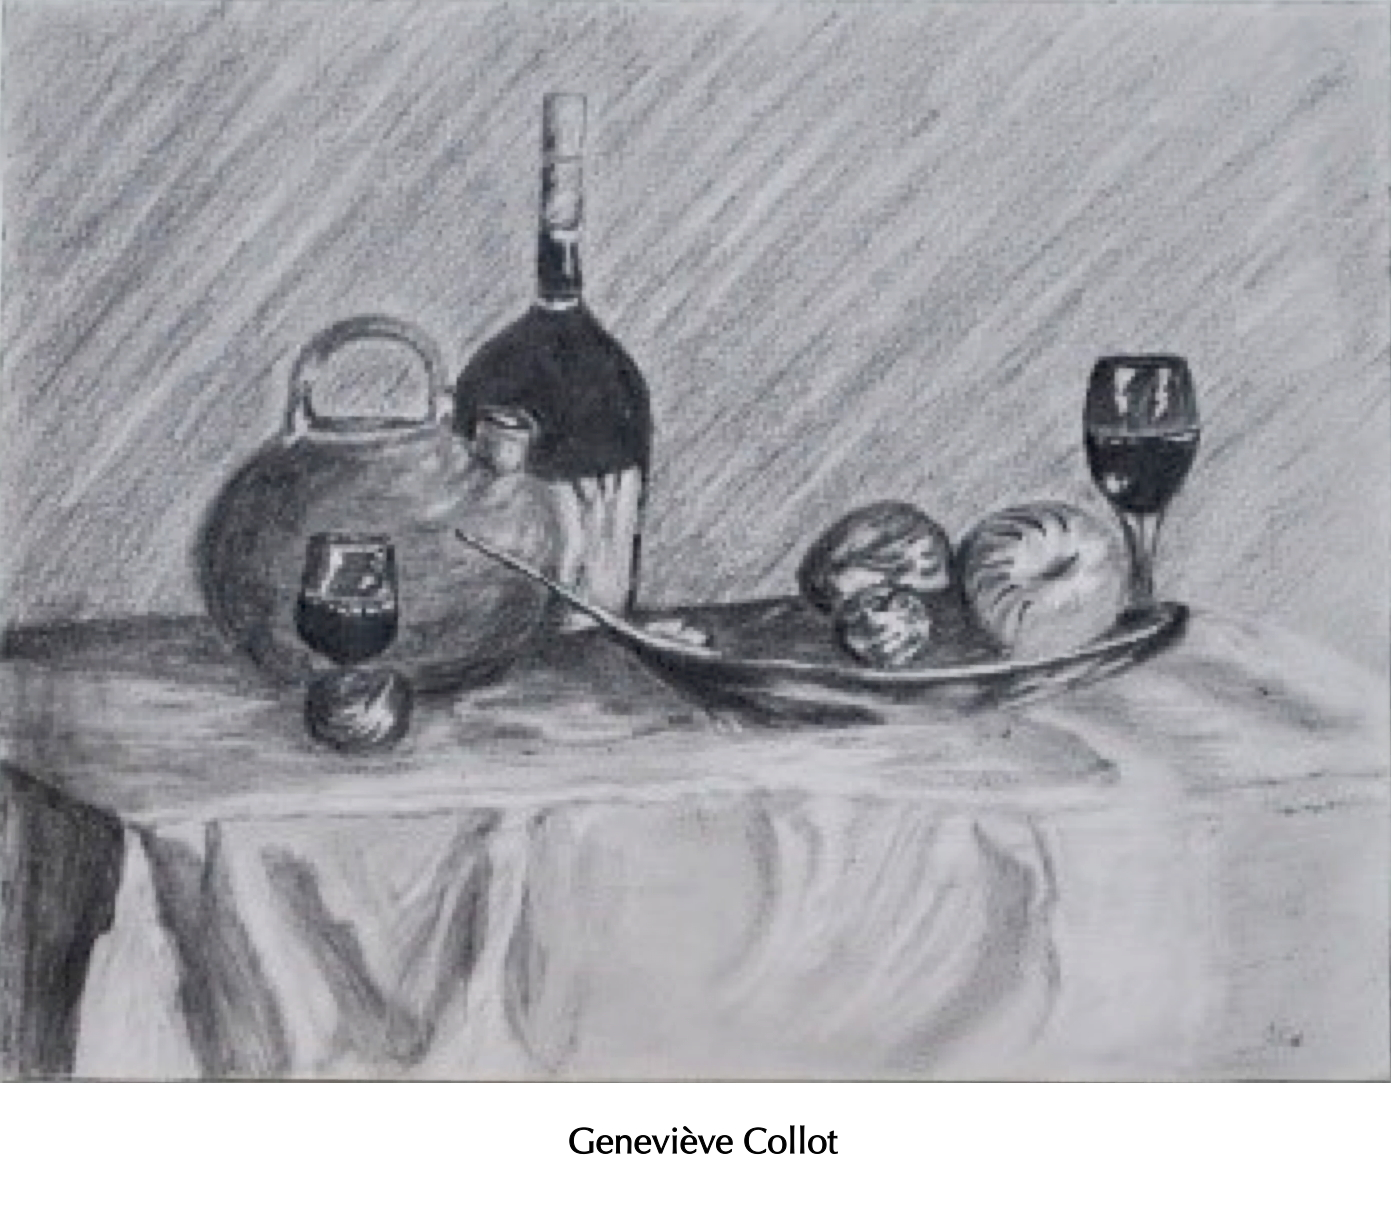 Genevieve Collot